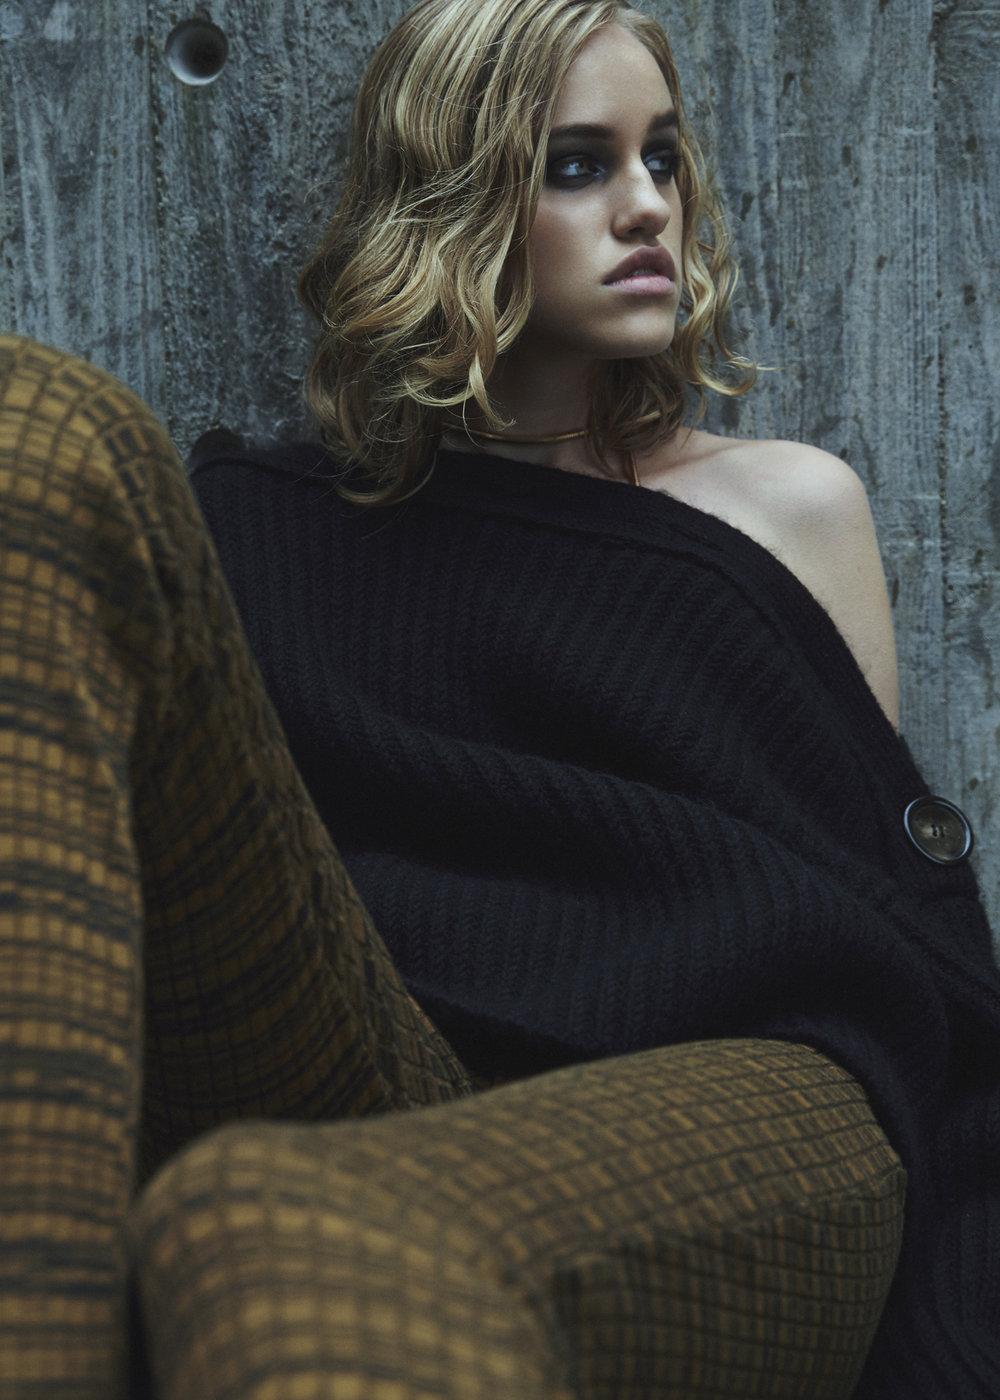 necklaces LARA BOHINC, knit sweater ACNE STUDIOS, trousers BAUM UND PFERDGARTEN